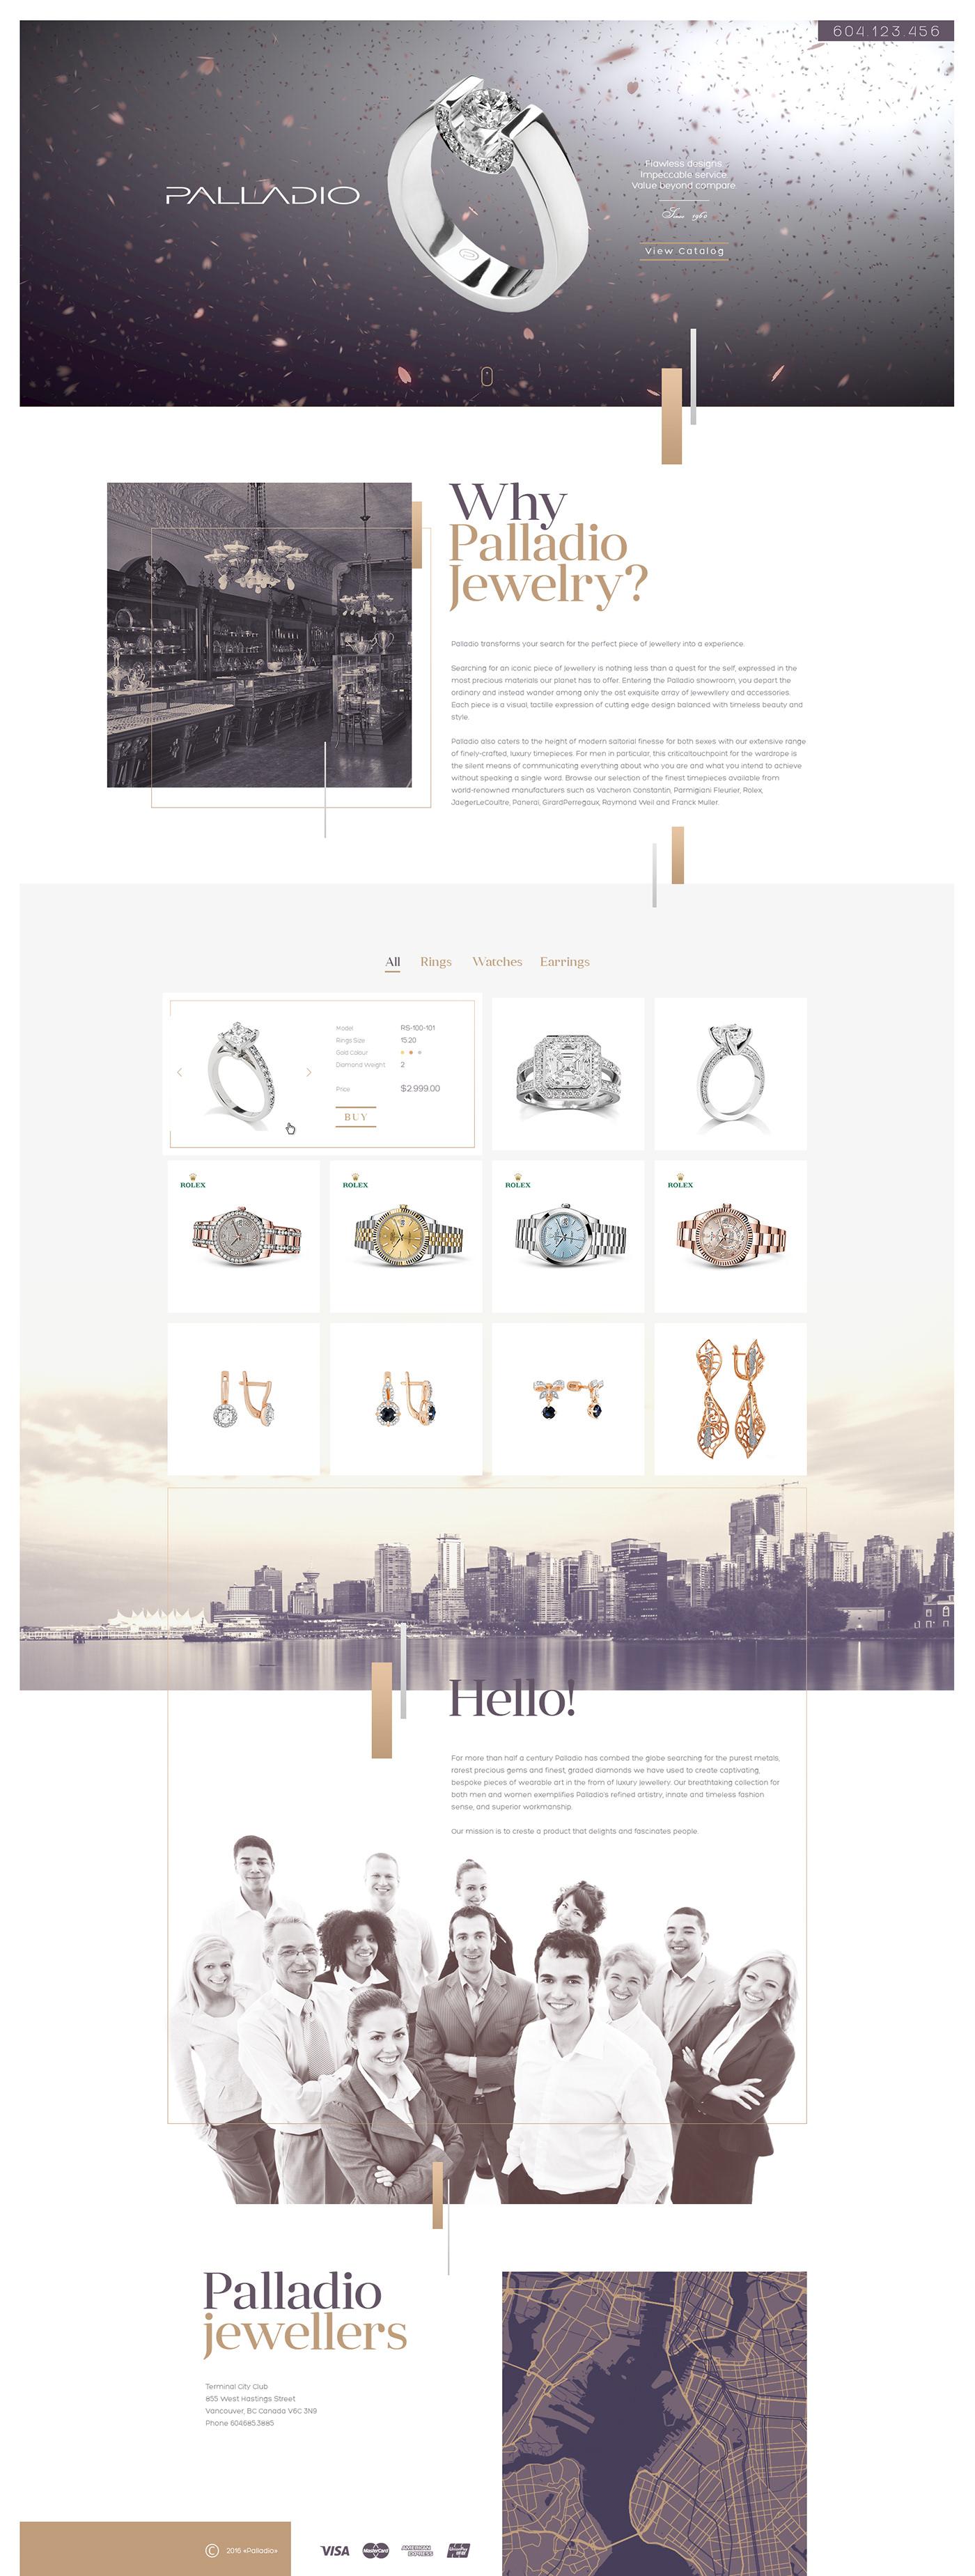 Palladio Website Design Webdesign UI/UX дизайн сайта jewelry landing page beauty ring